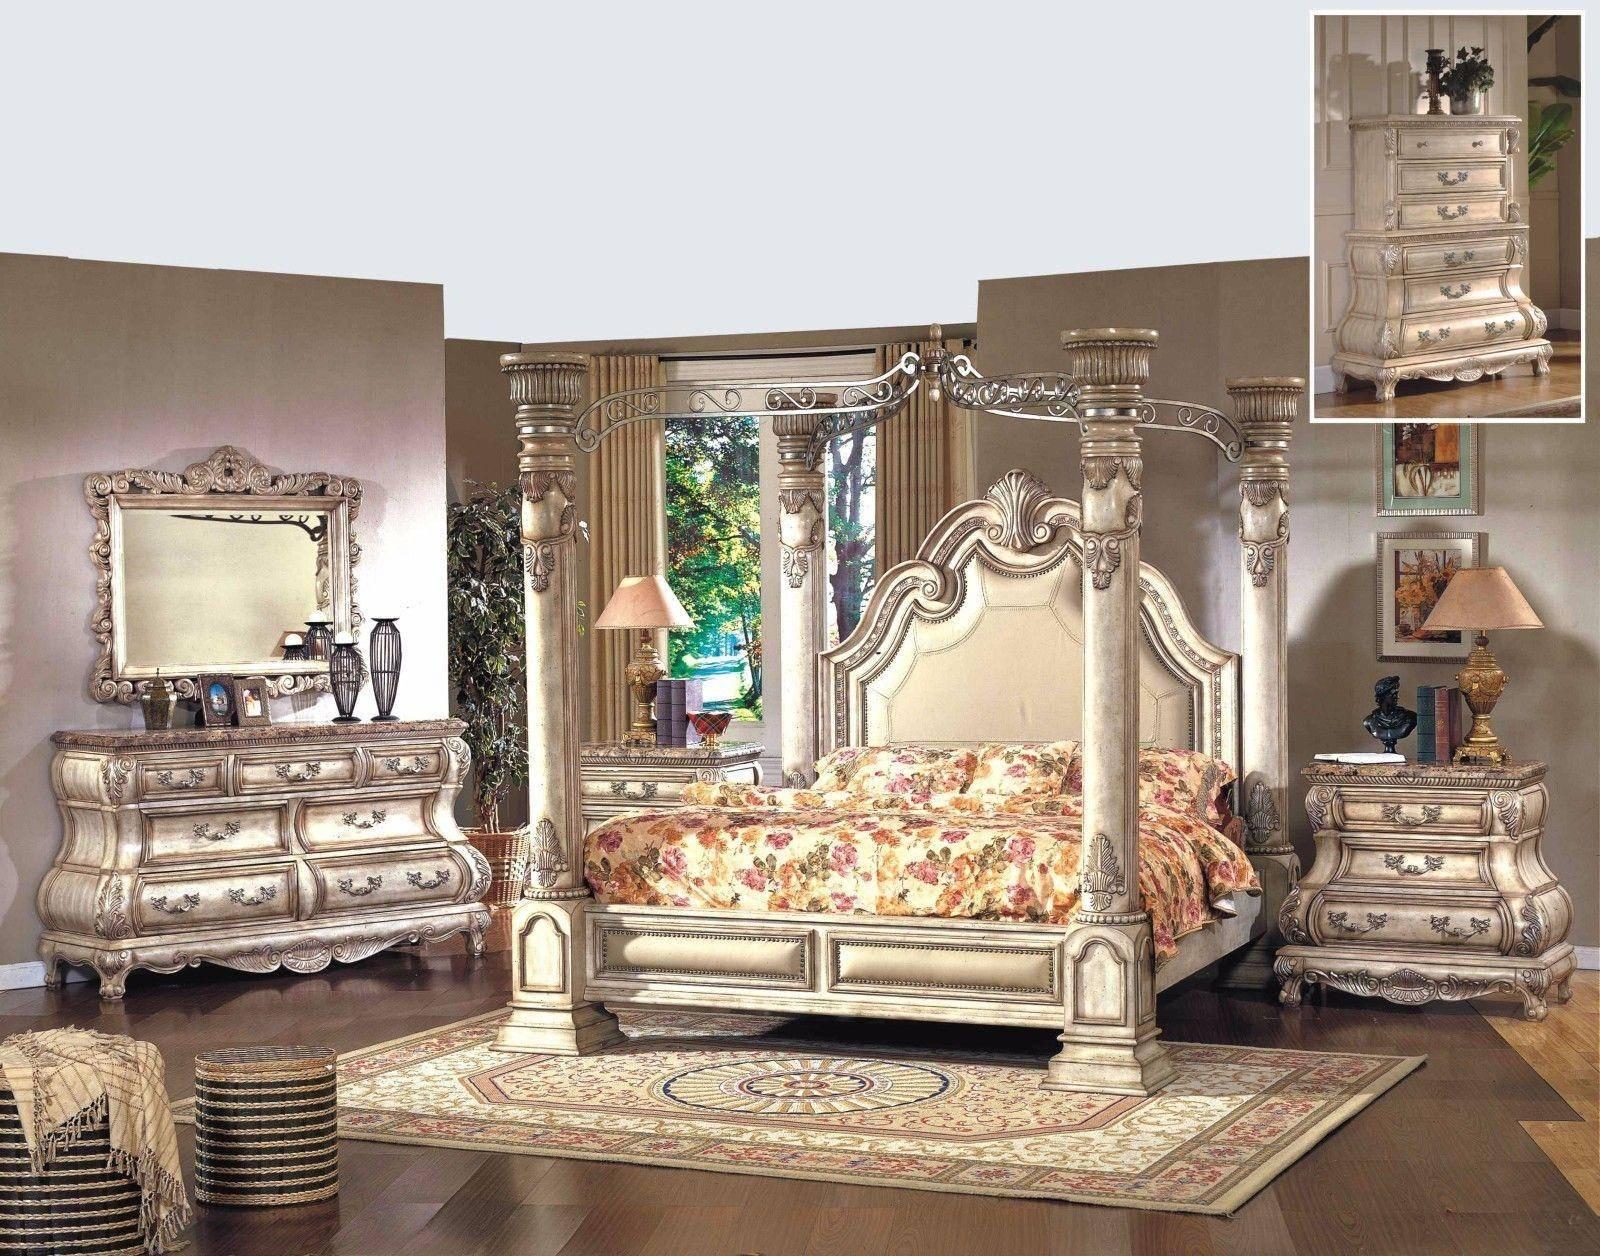 Buy Mcferran Monaco King Canopy Bedroom Set 5 Pcs In White Leather Online